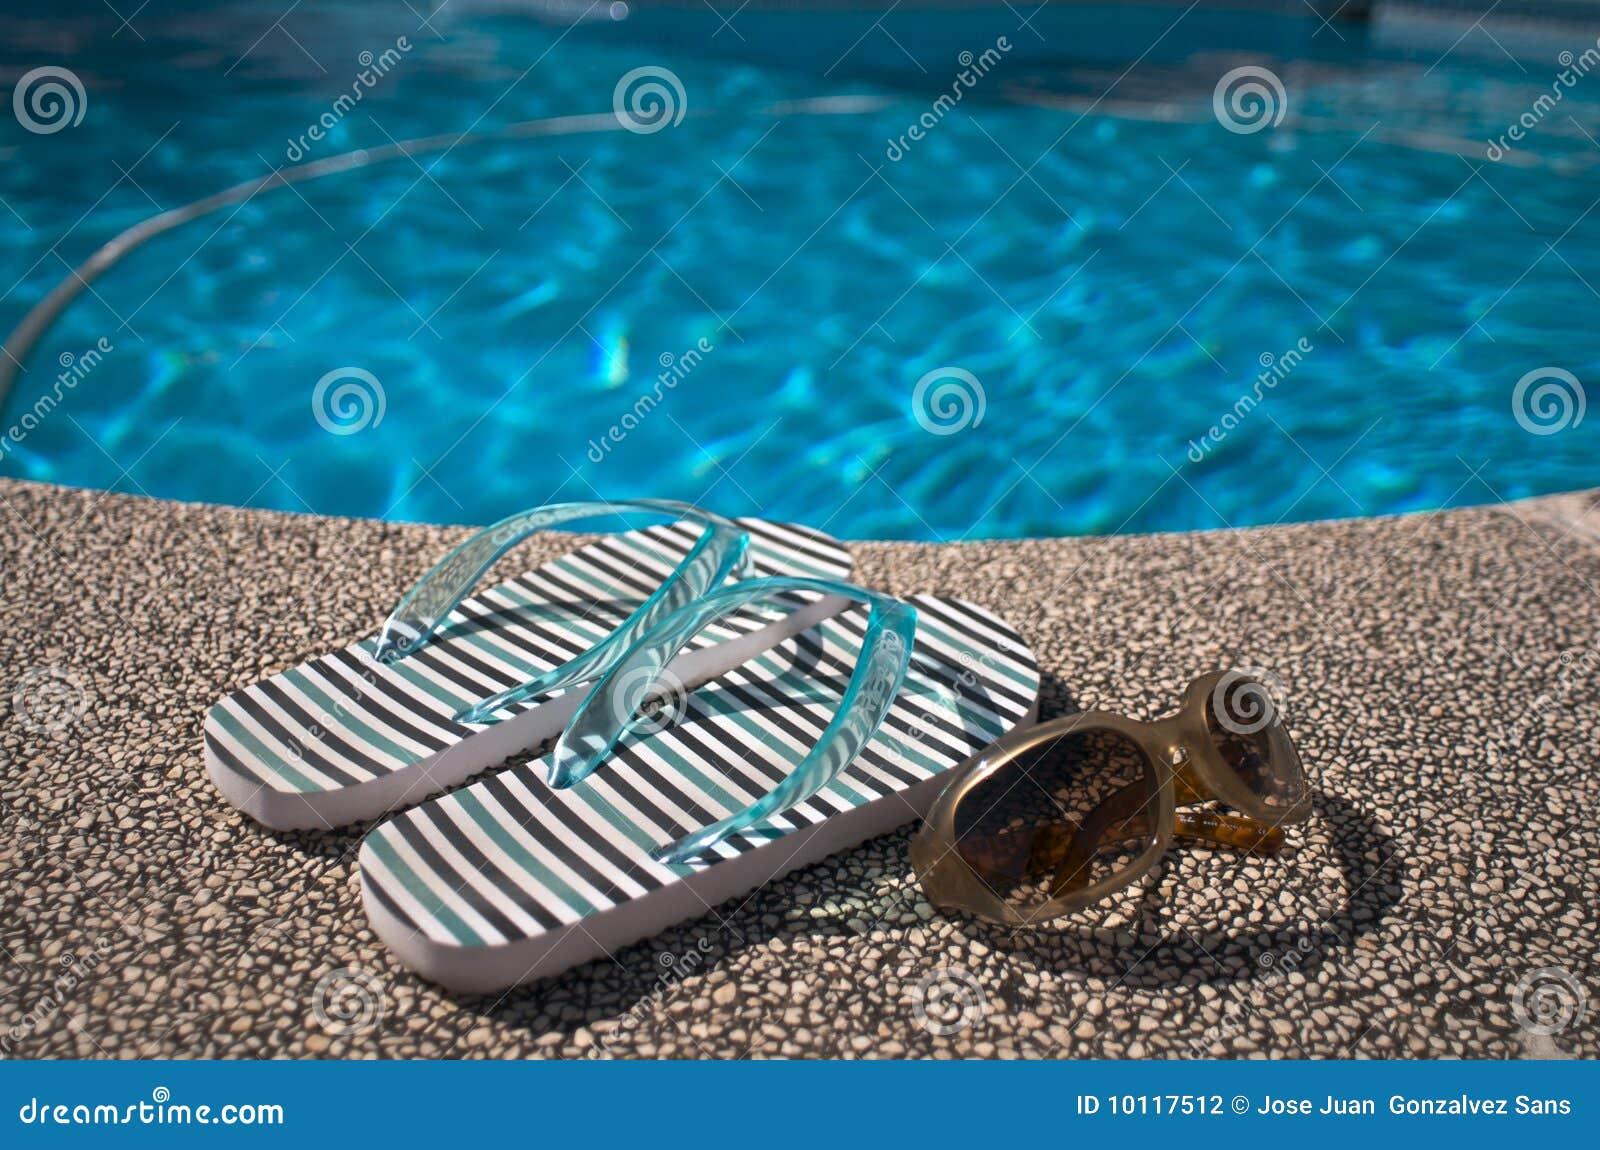 Piscina stock photography image 10117512 - Business plan piscina ...